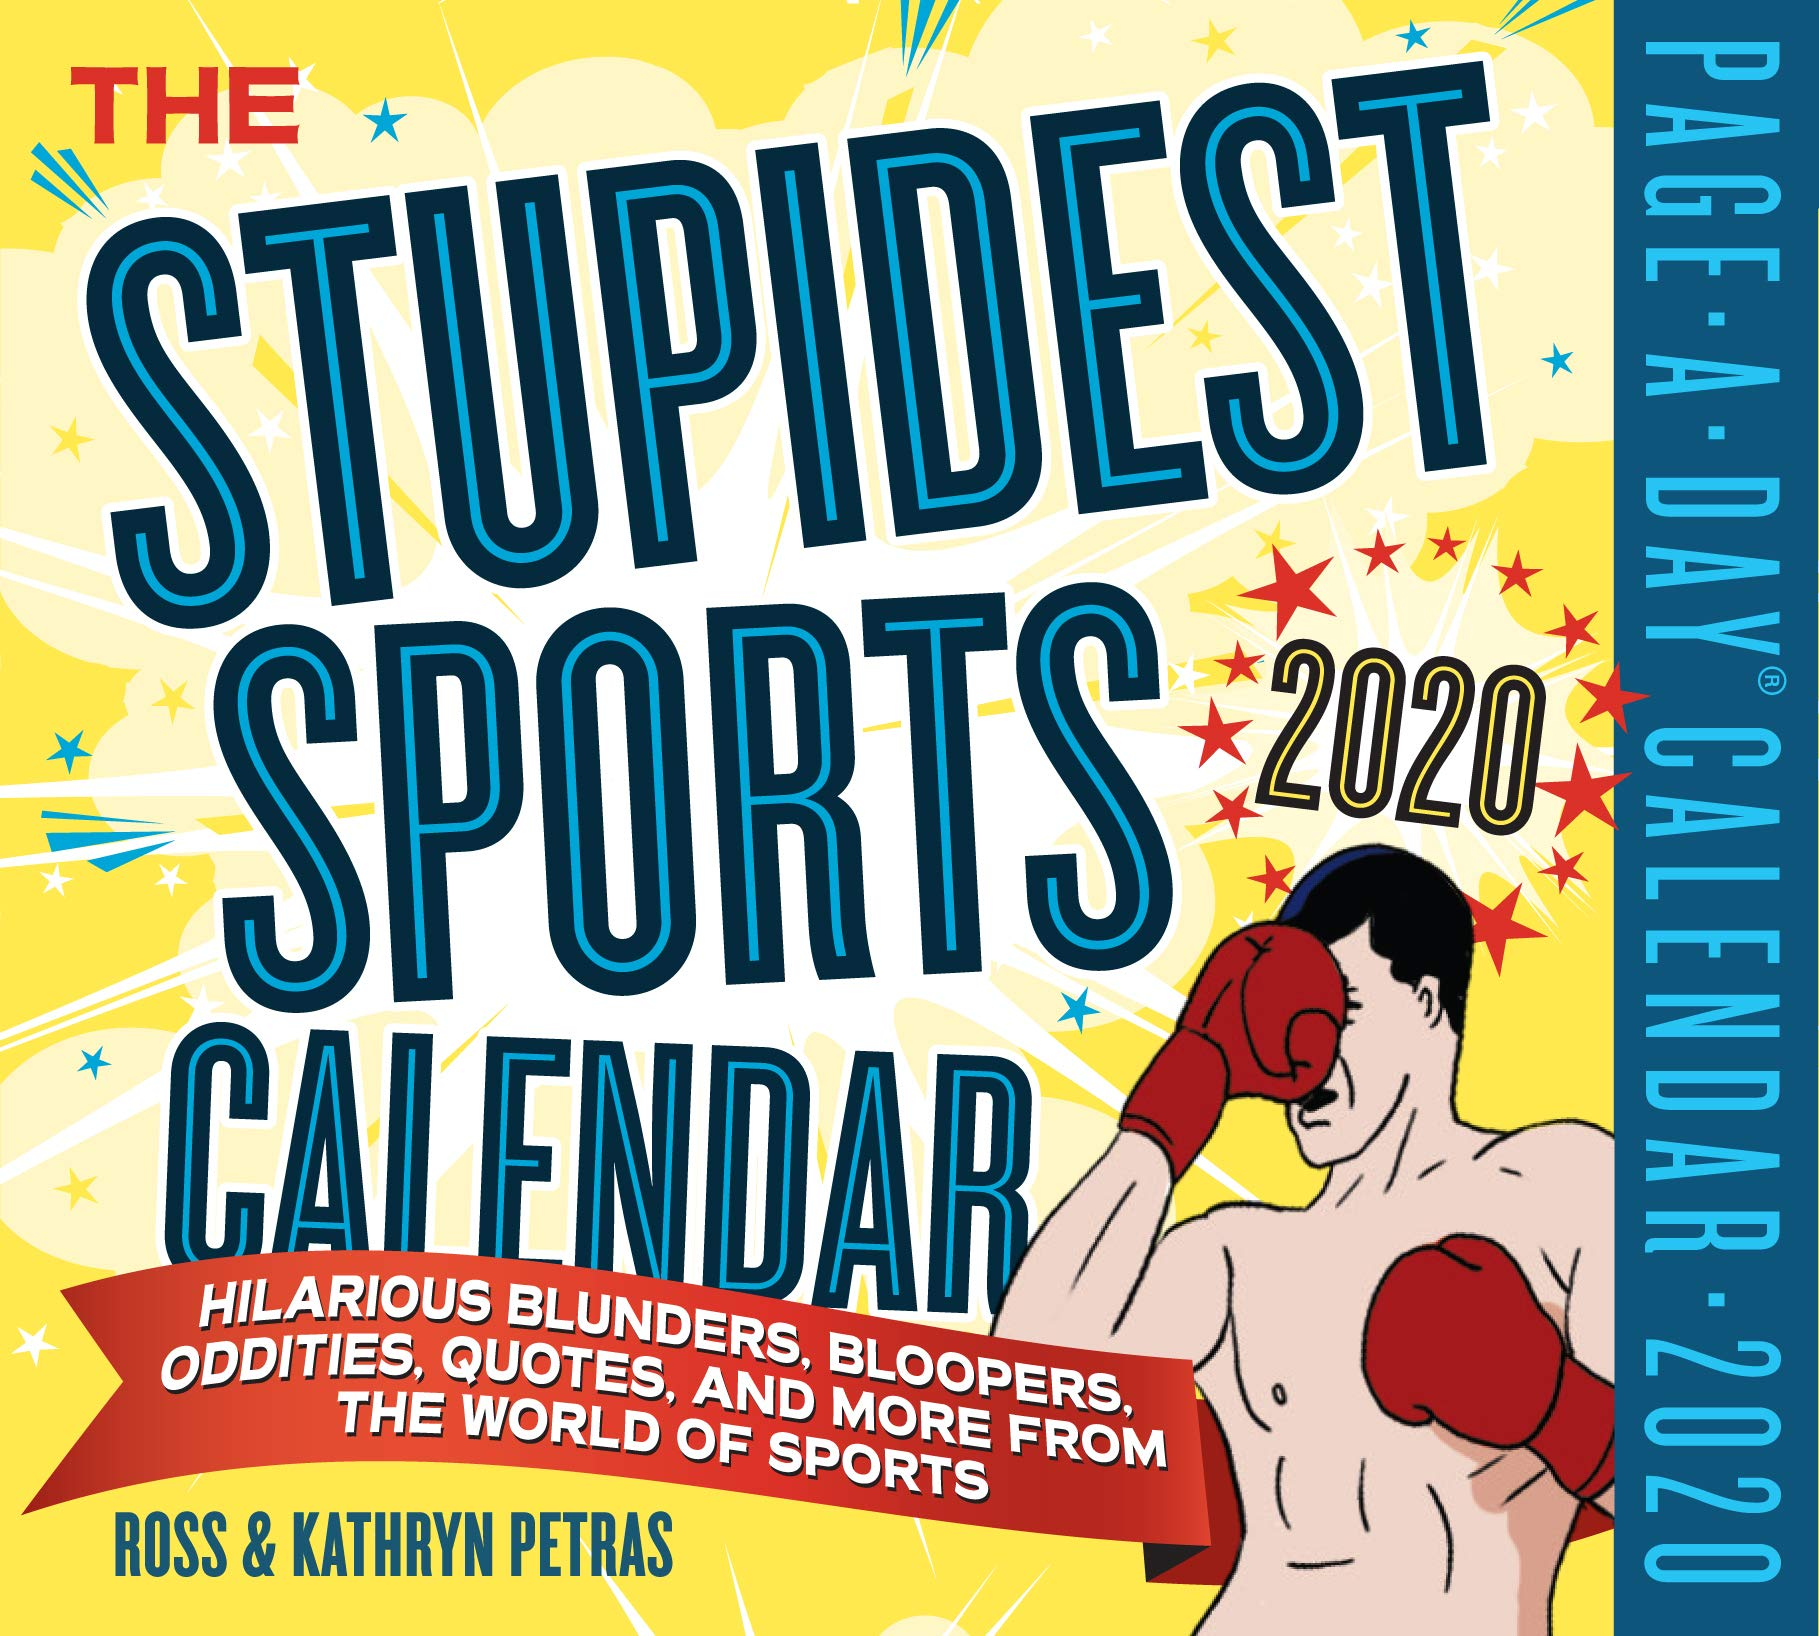 Sports Calendar 2020 Stupidest Sports Page A Day Calendar 2020: Kathryn Petras, Ross